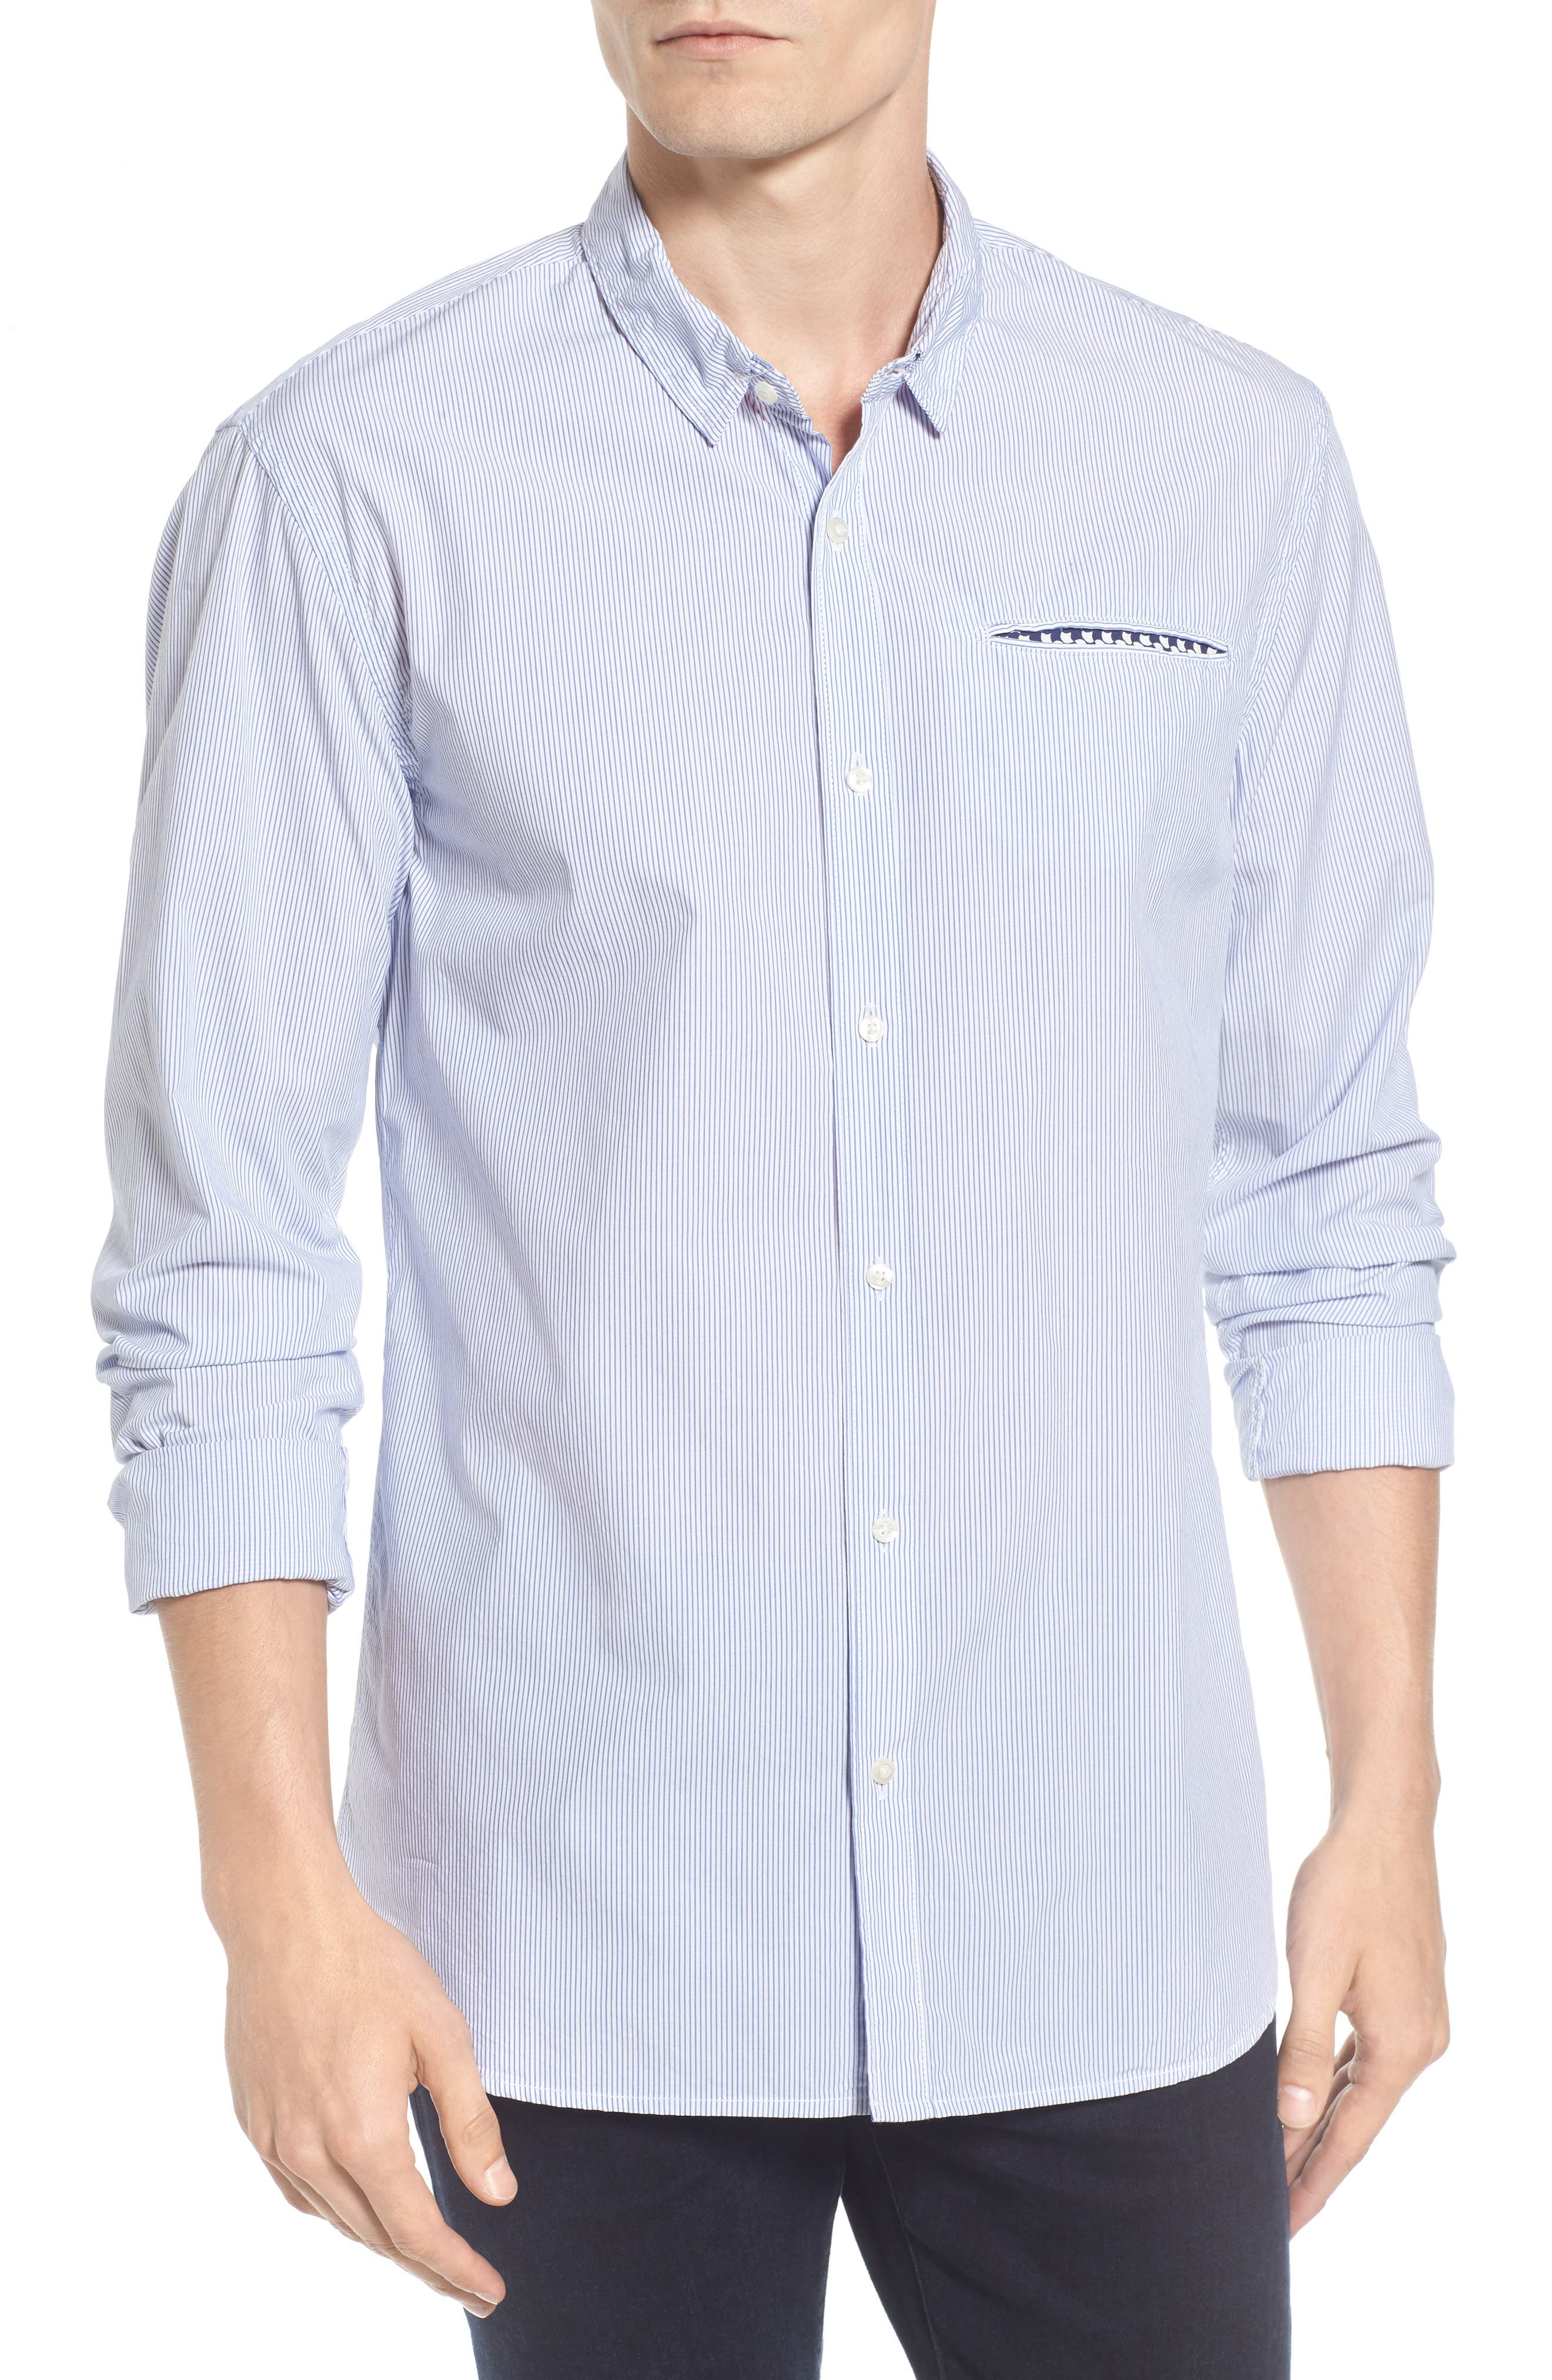 Alternate Image 1 Selected - Scotch & Soda Woven Stripe Shirt